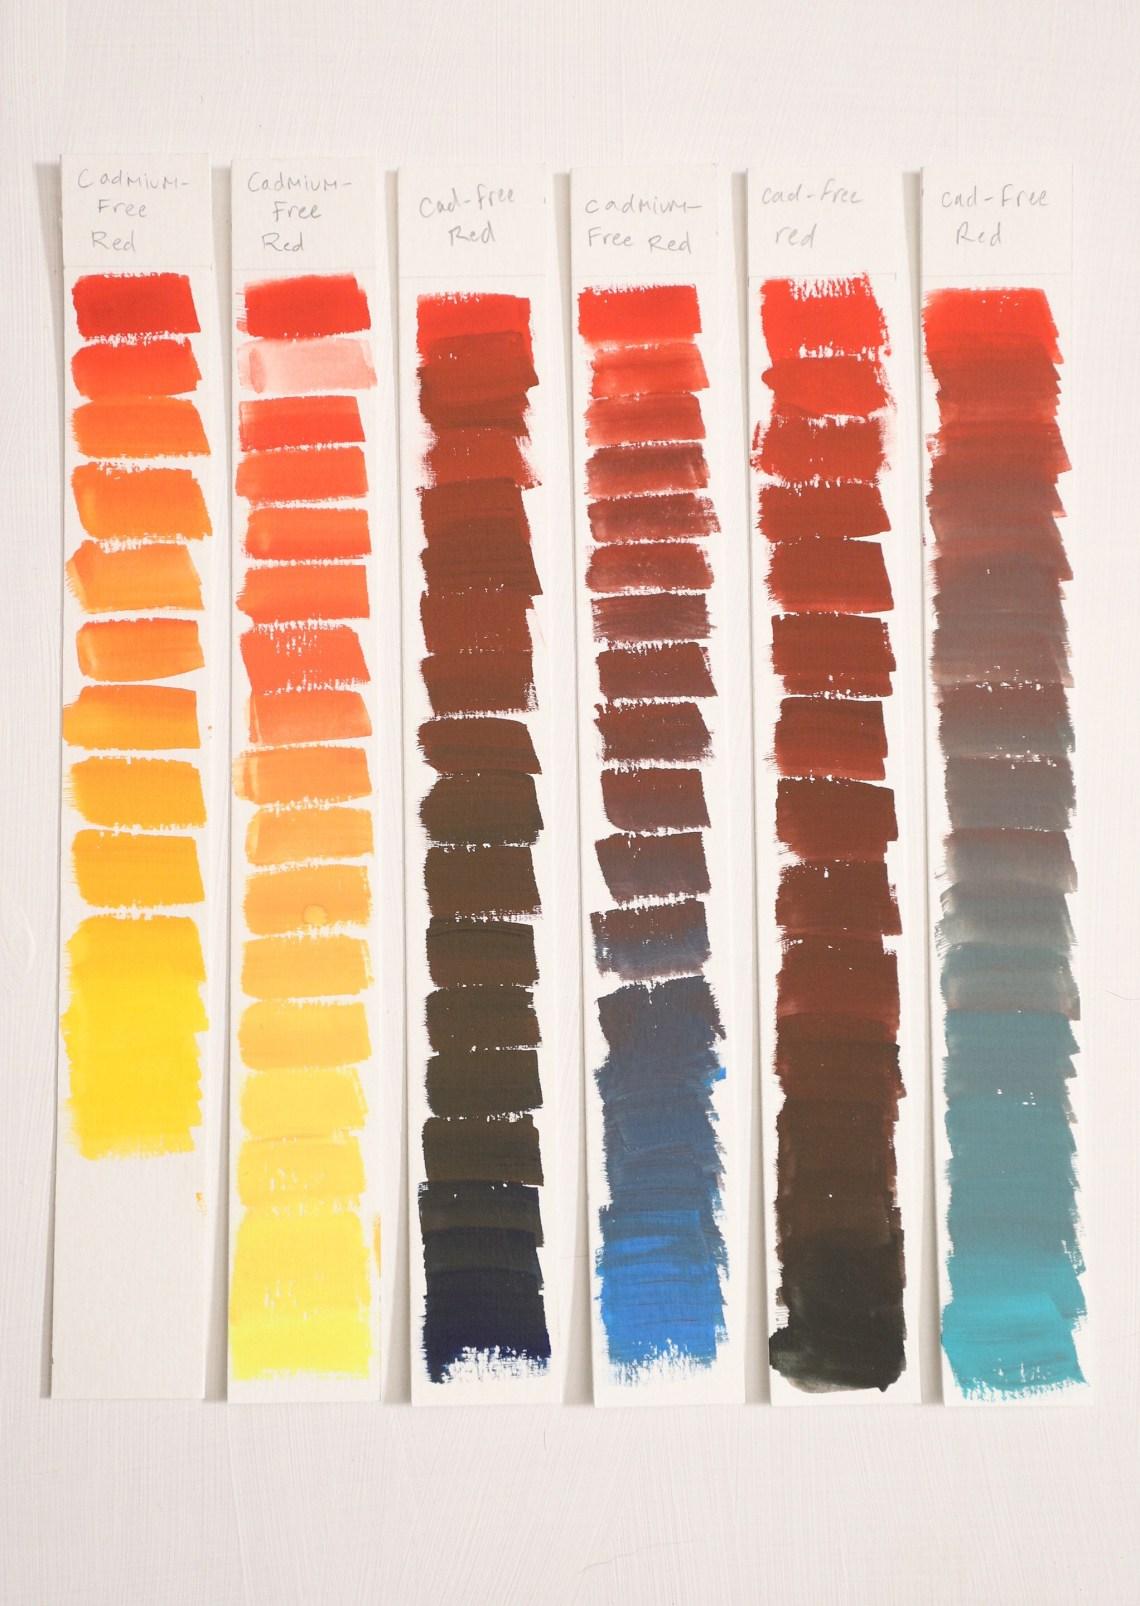 Cadmium-free red Gouache mixing chart